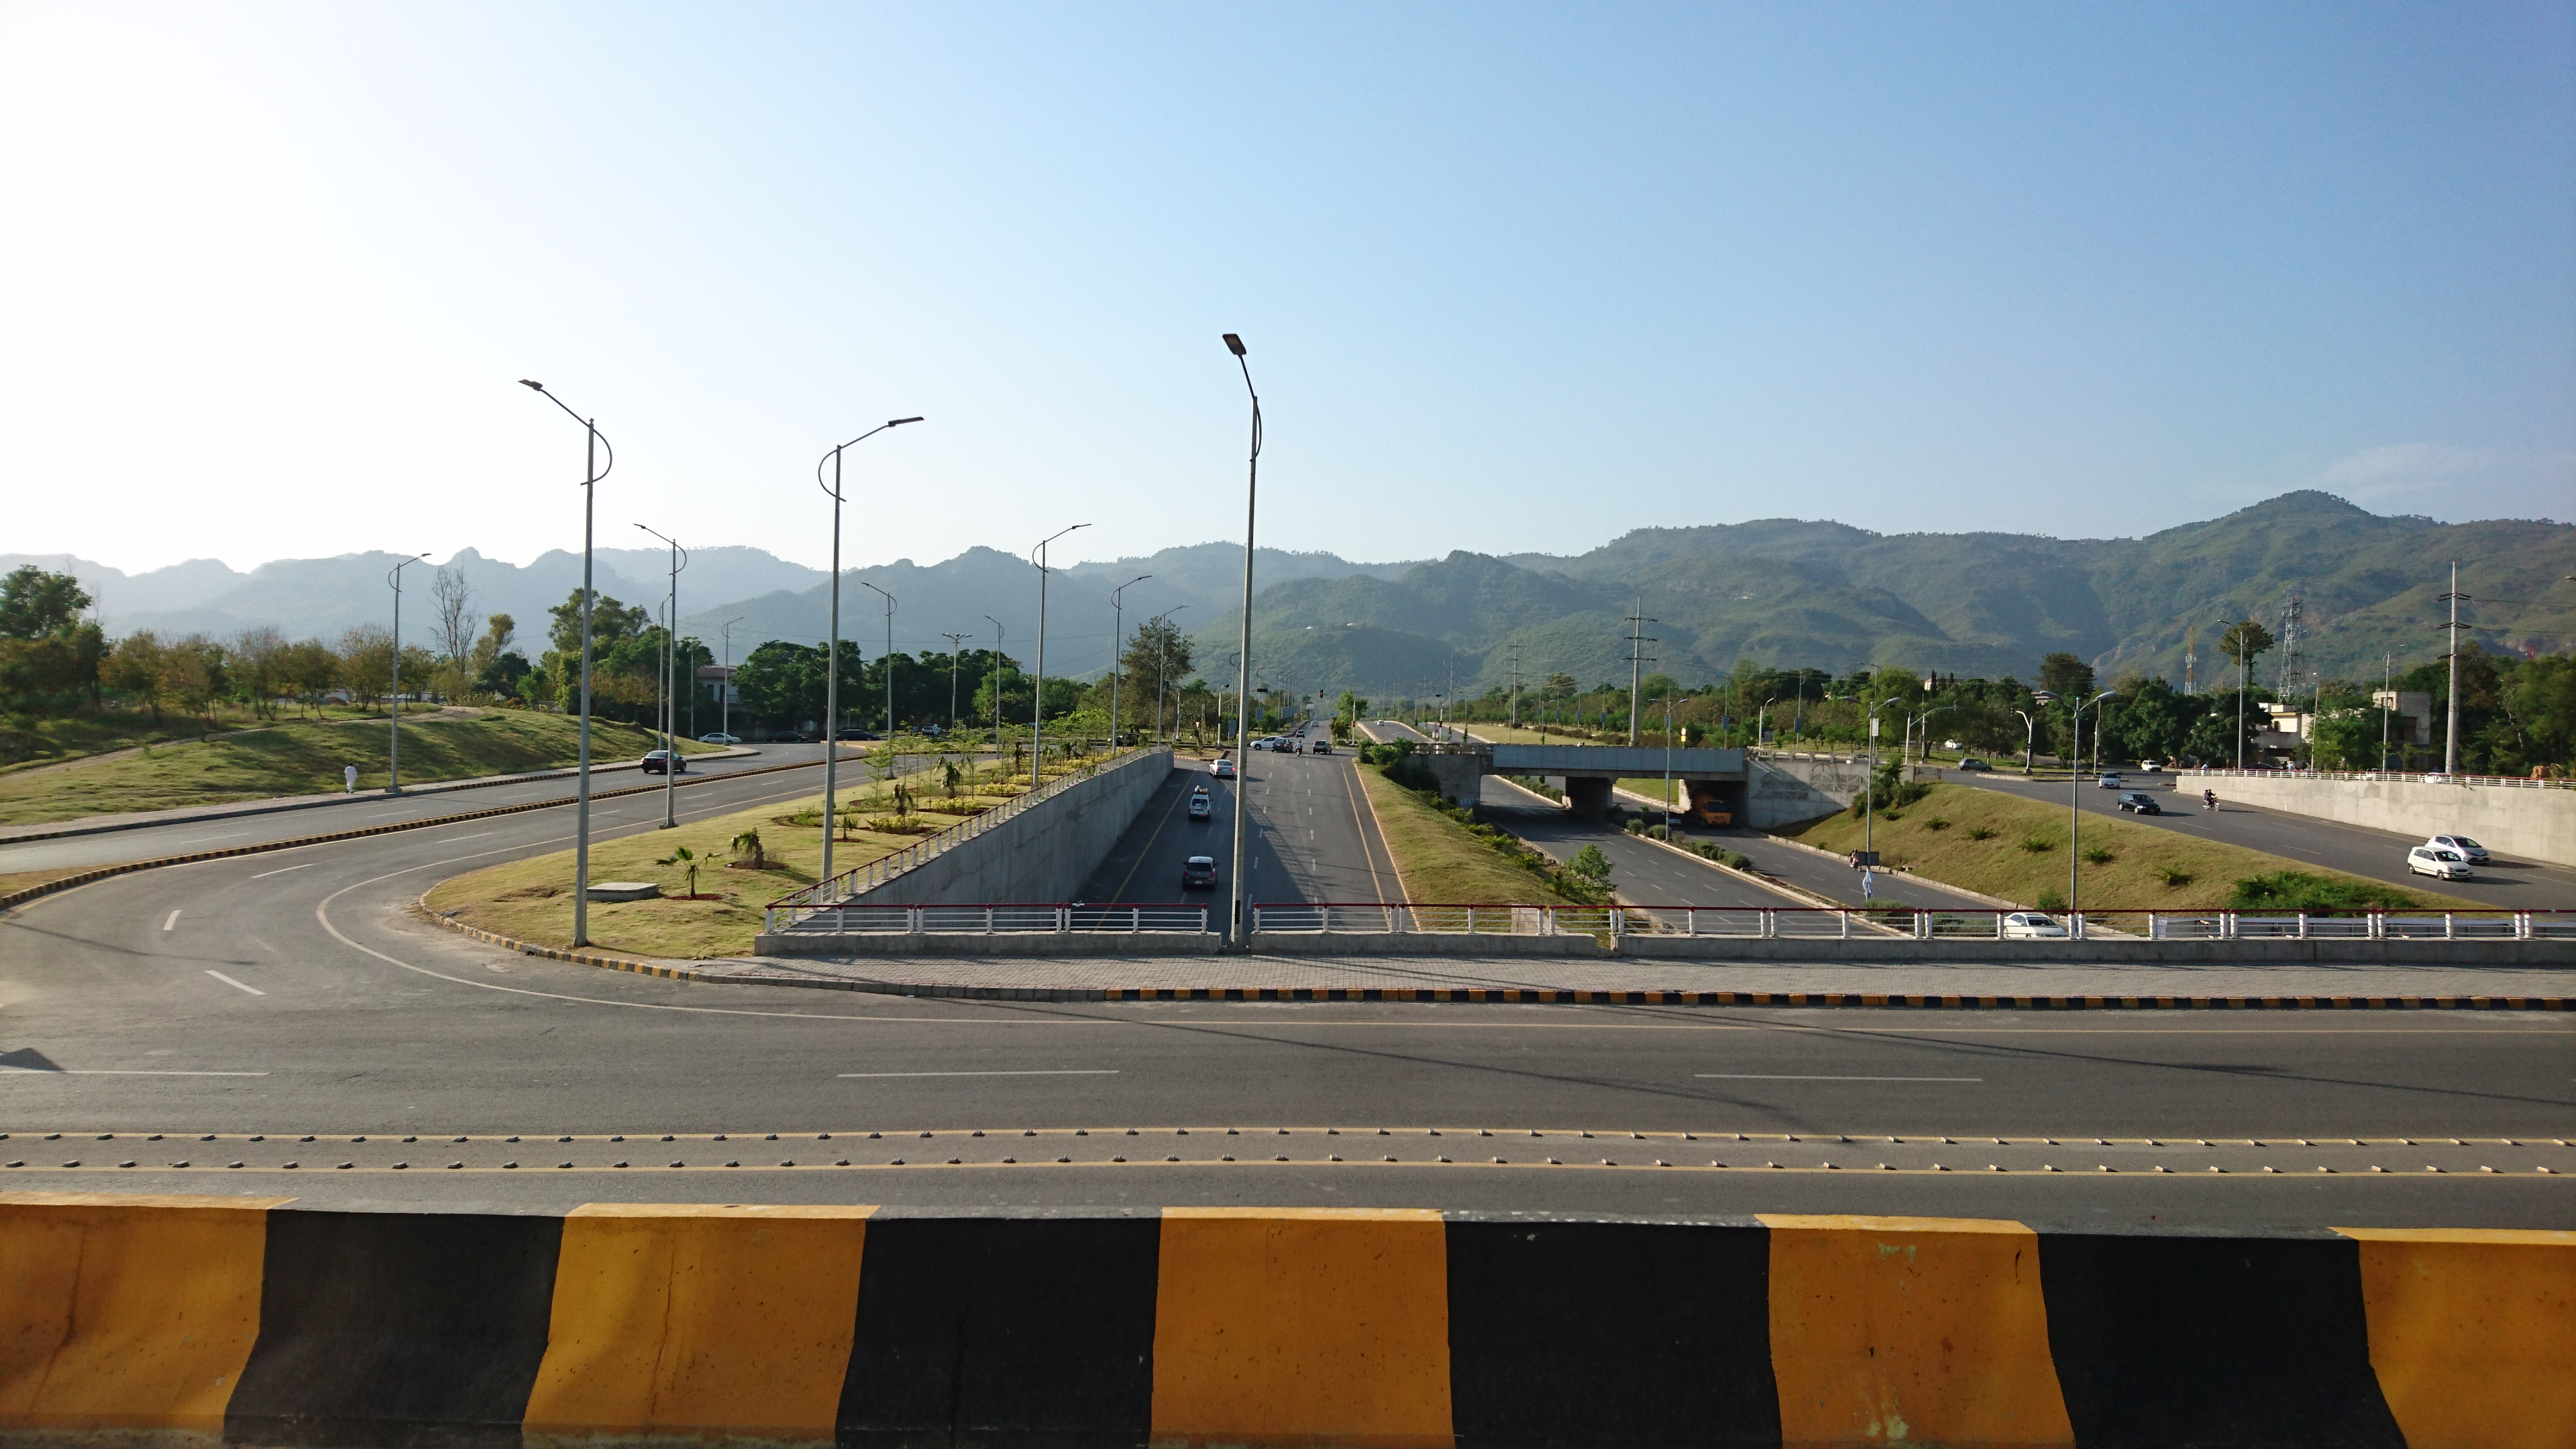 File:Capital city Islamabad JPG - Wikimedia Commons